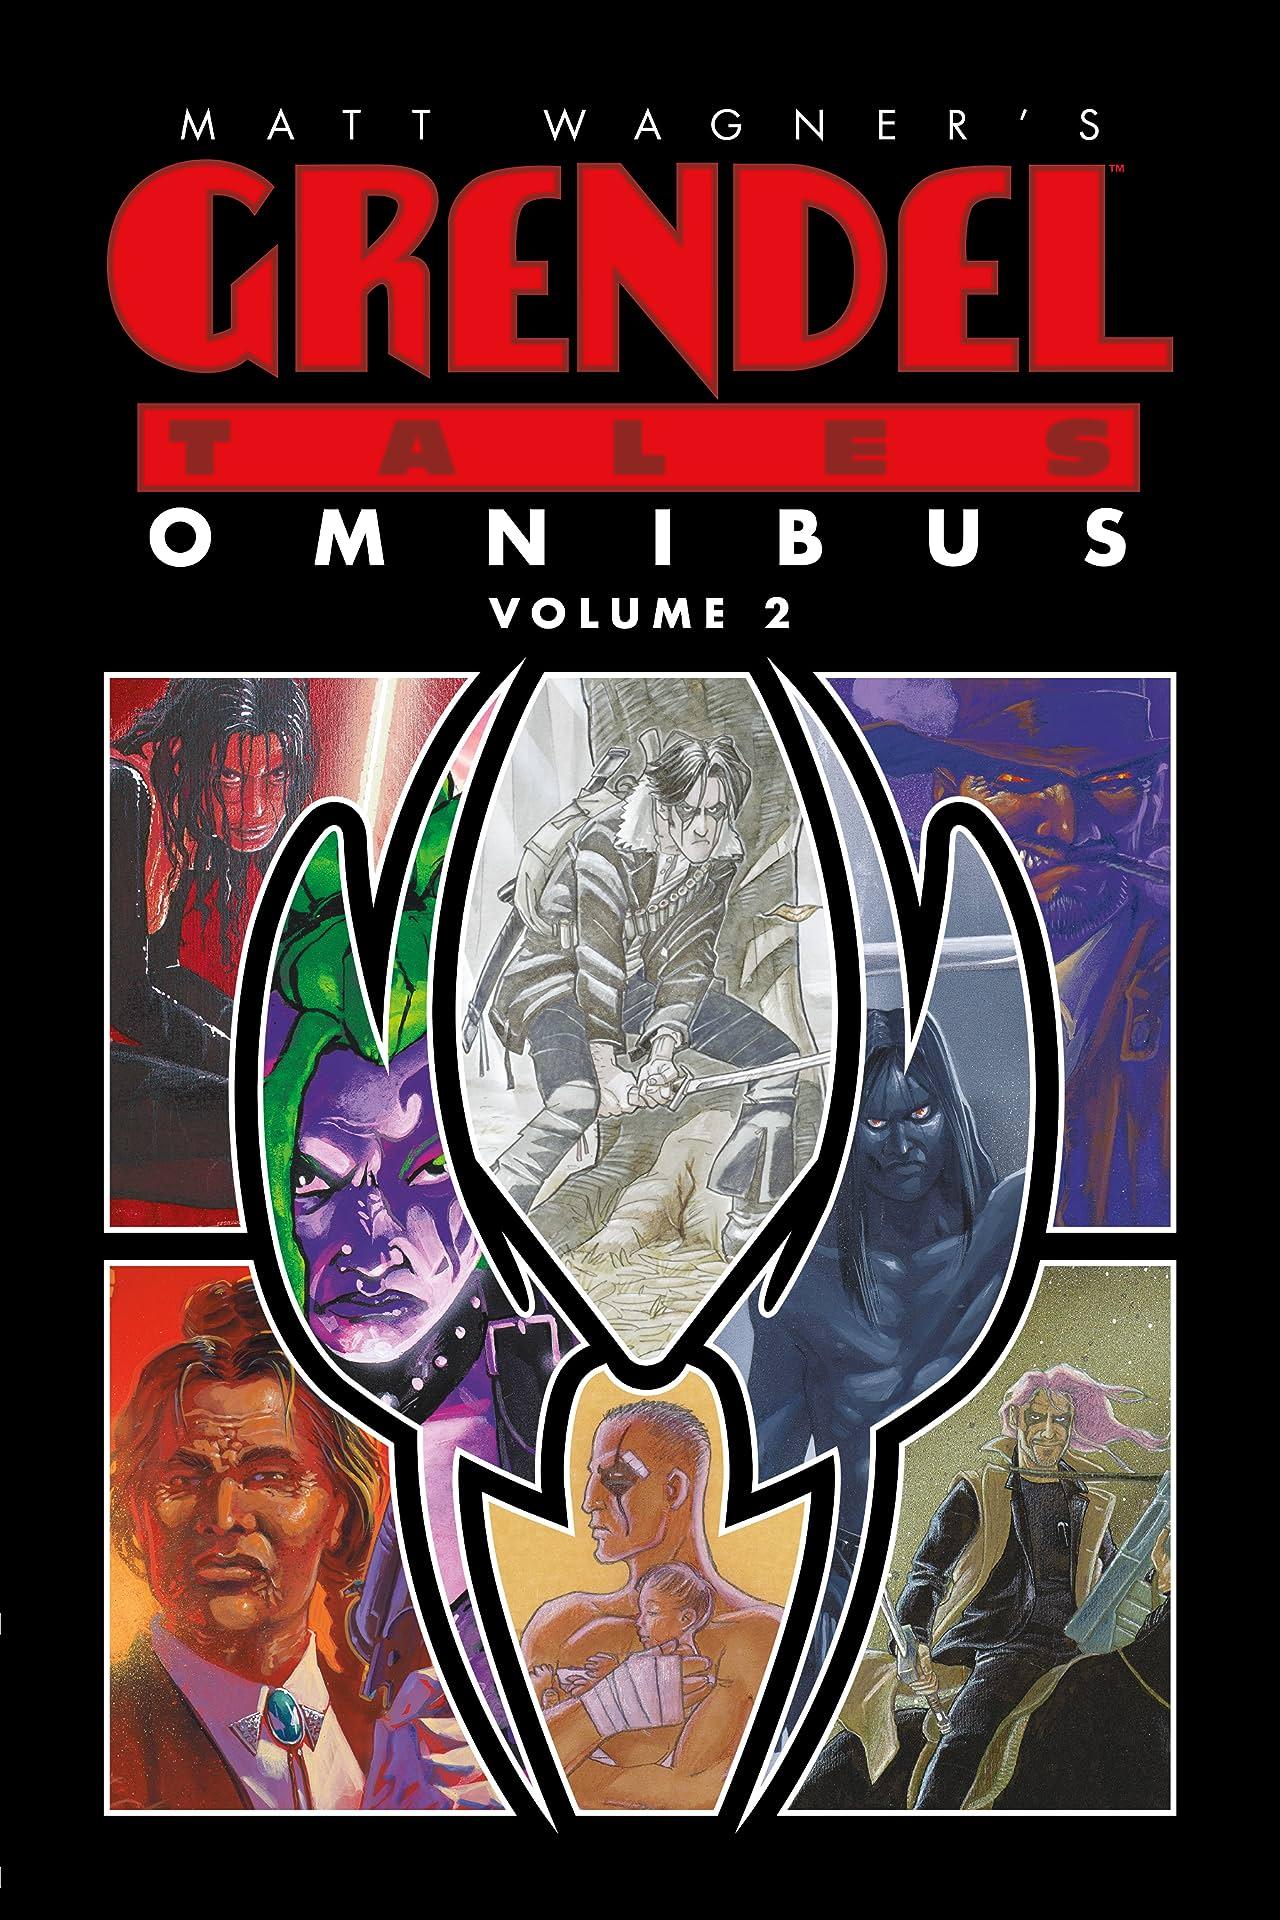 Matt Wagner's Grendel Tales Omnibus Vol. 2